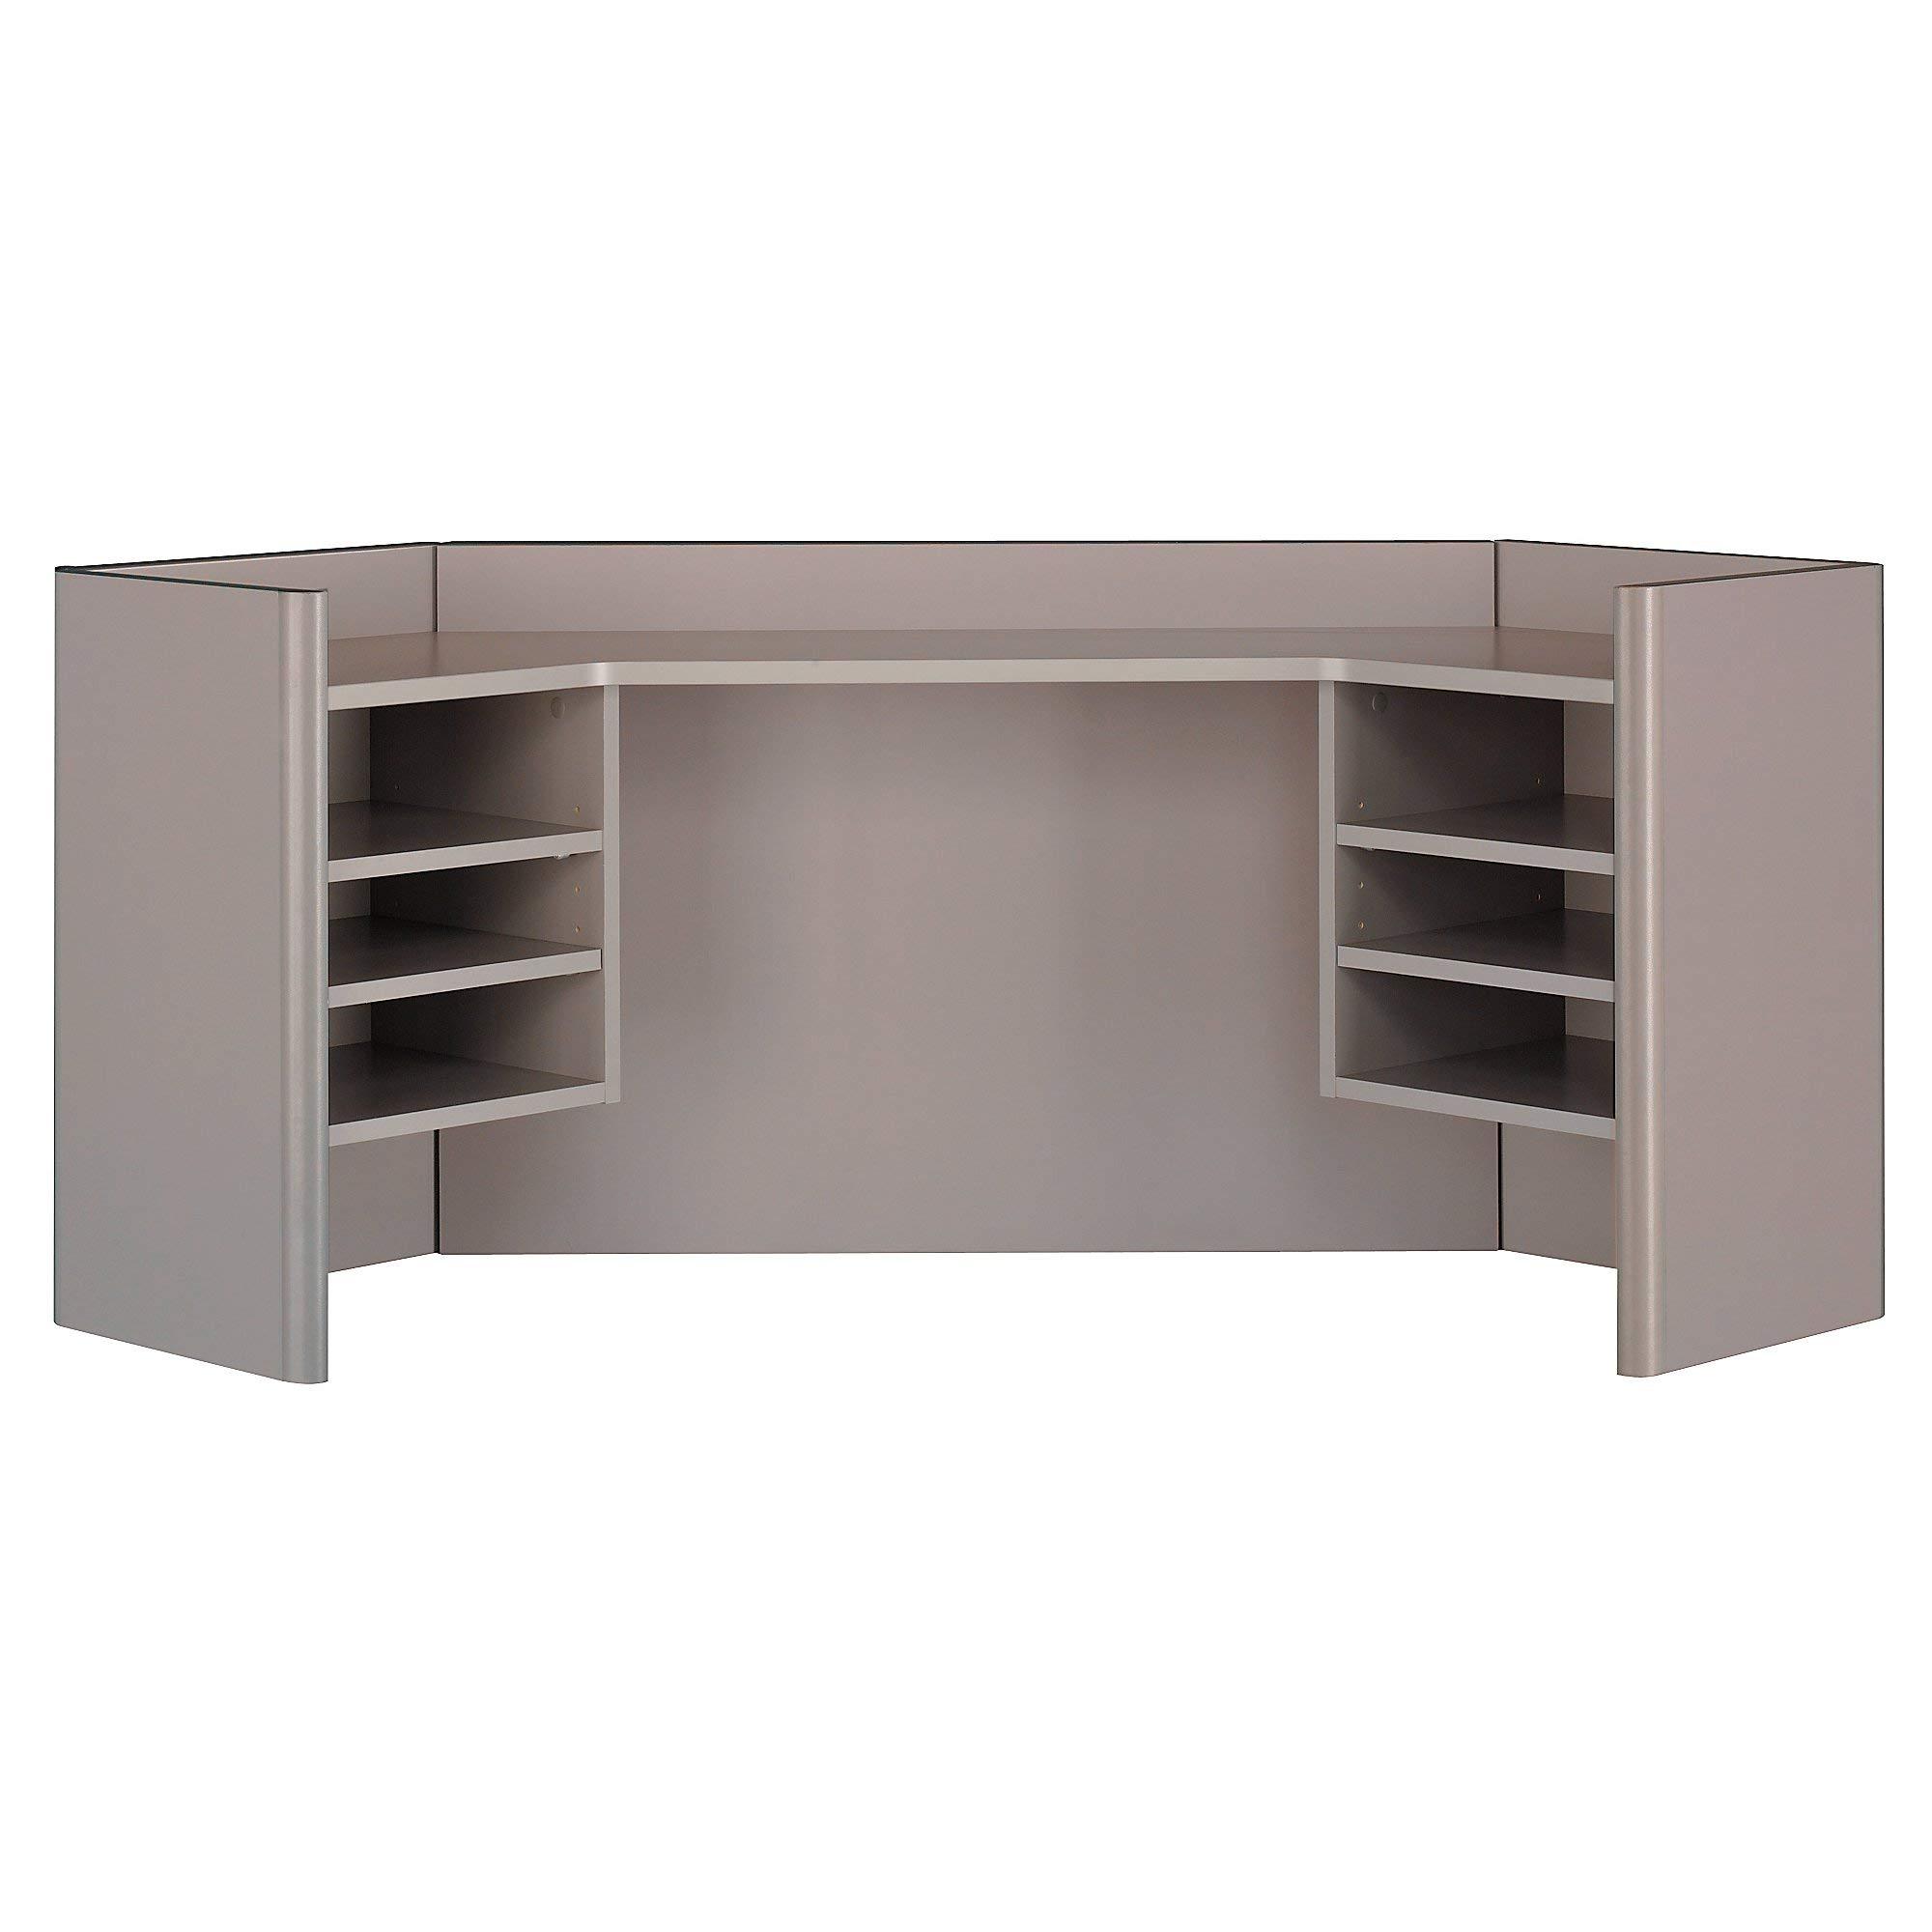 Bush Business Furniture Series A Collection 42W Corner Hutch in White Spectrum